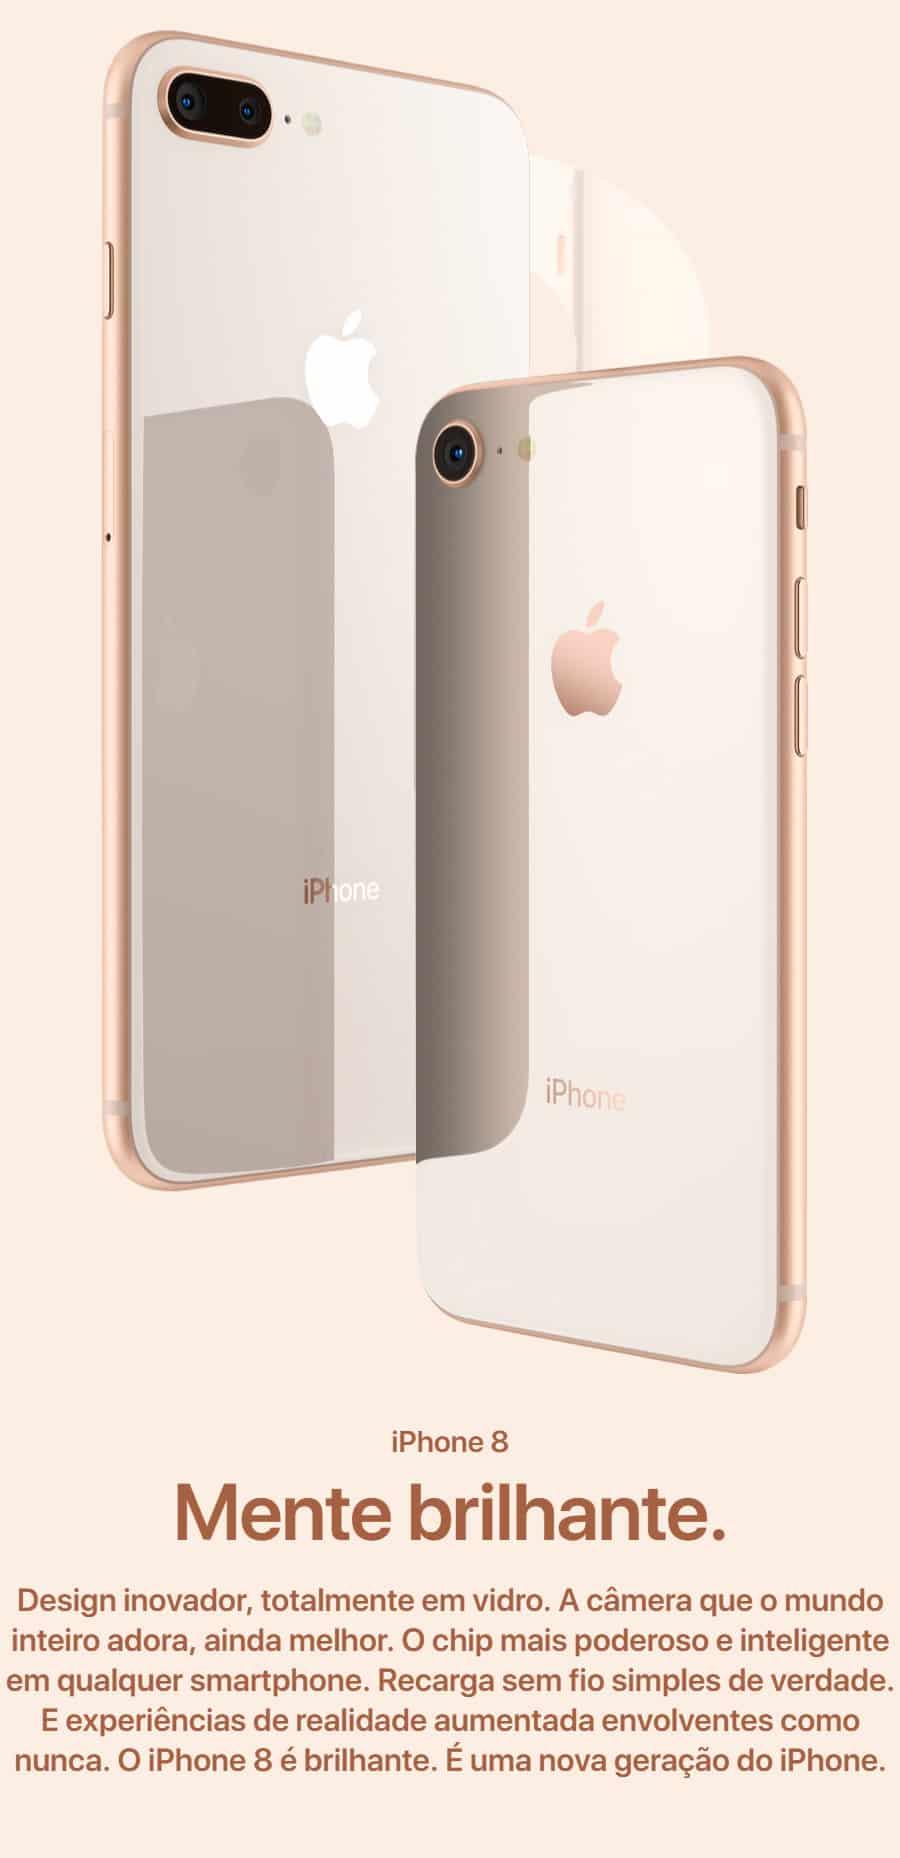 Celular Apple iPhone 8 64 GB Unlocked LIVRE DE TAXAS ALFANDEGARIAS